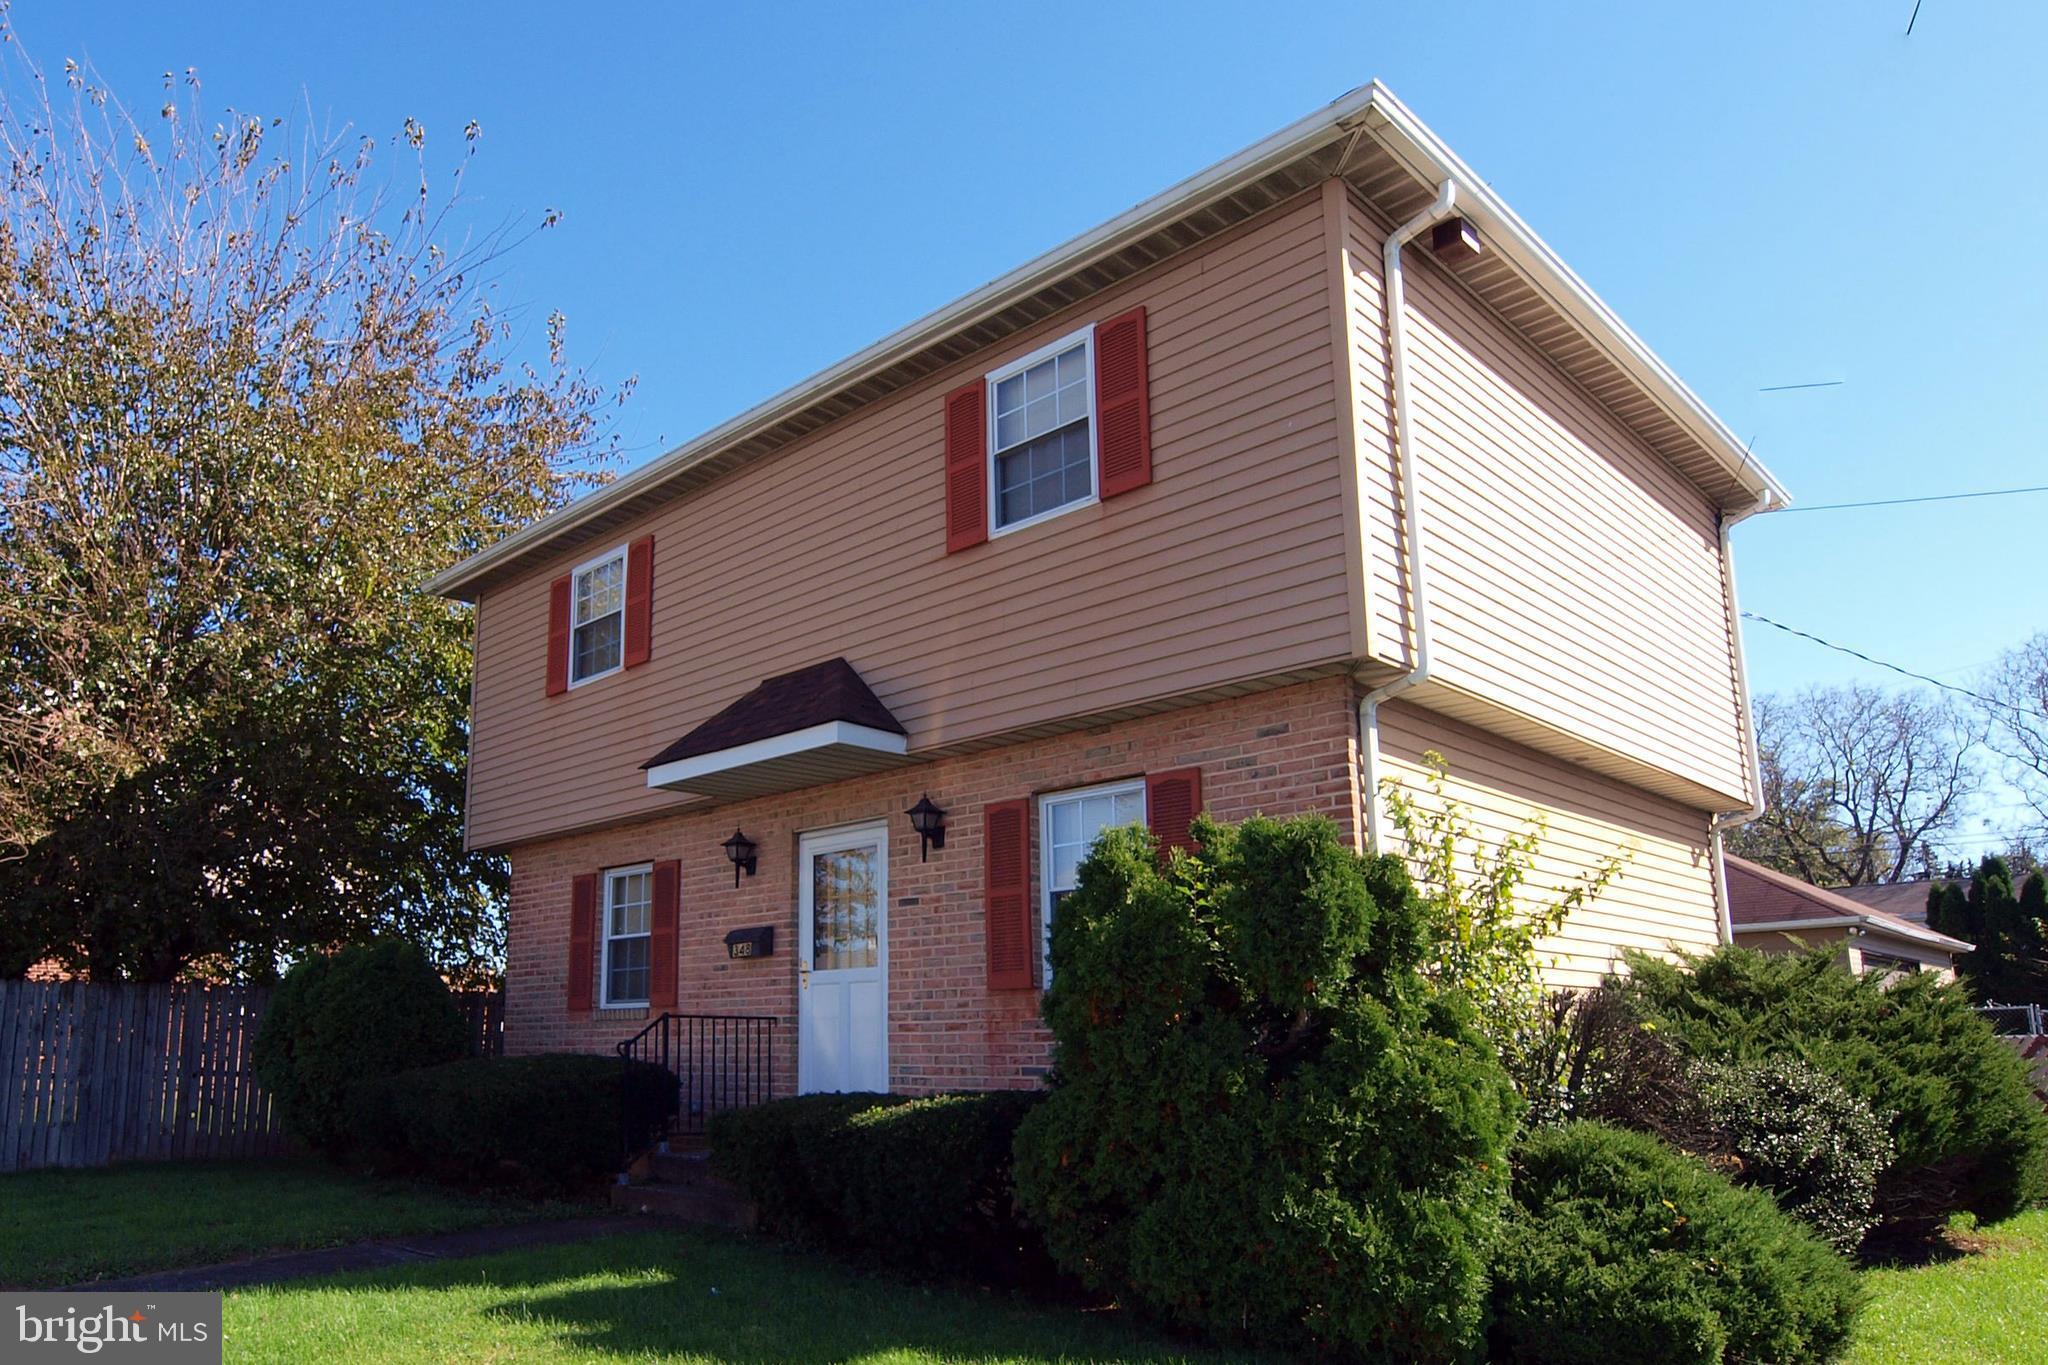 348 W FEDERAL STREET, ALLENTOWN, PA 18103